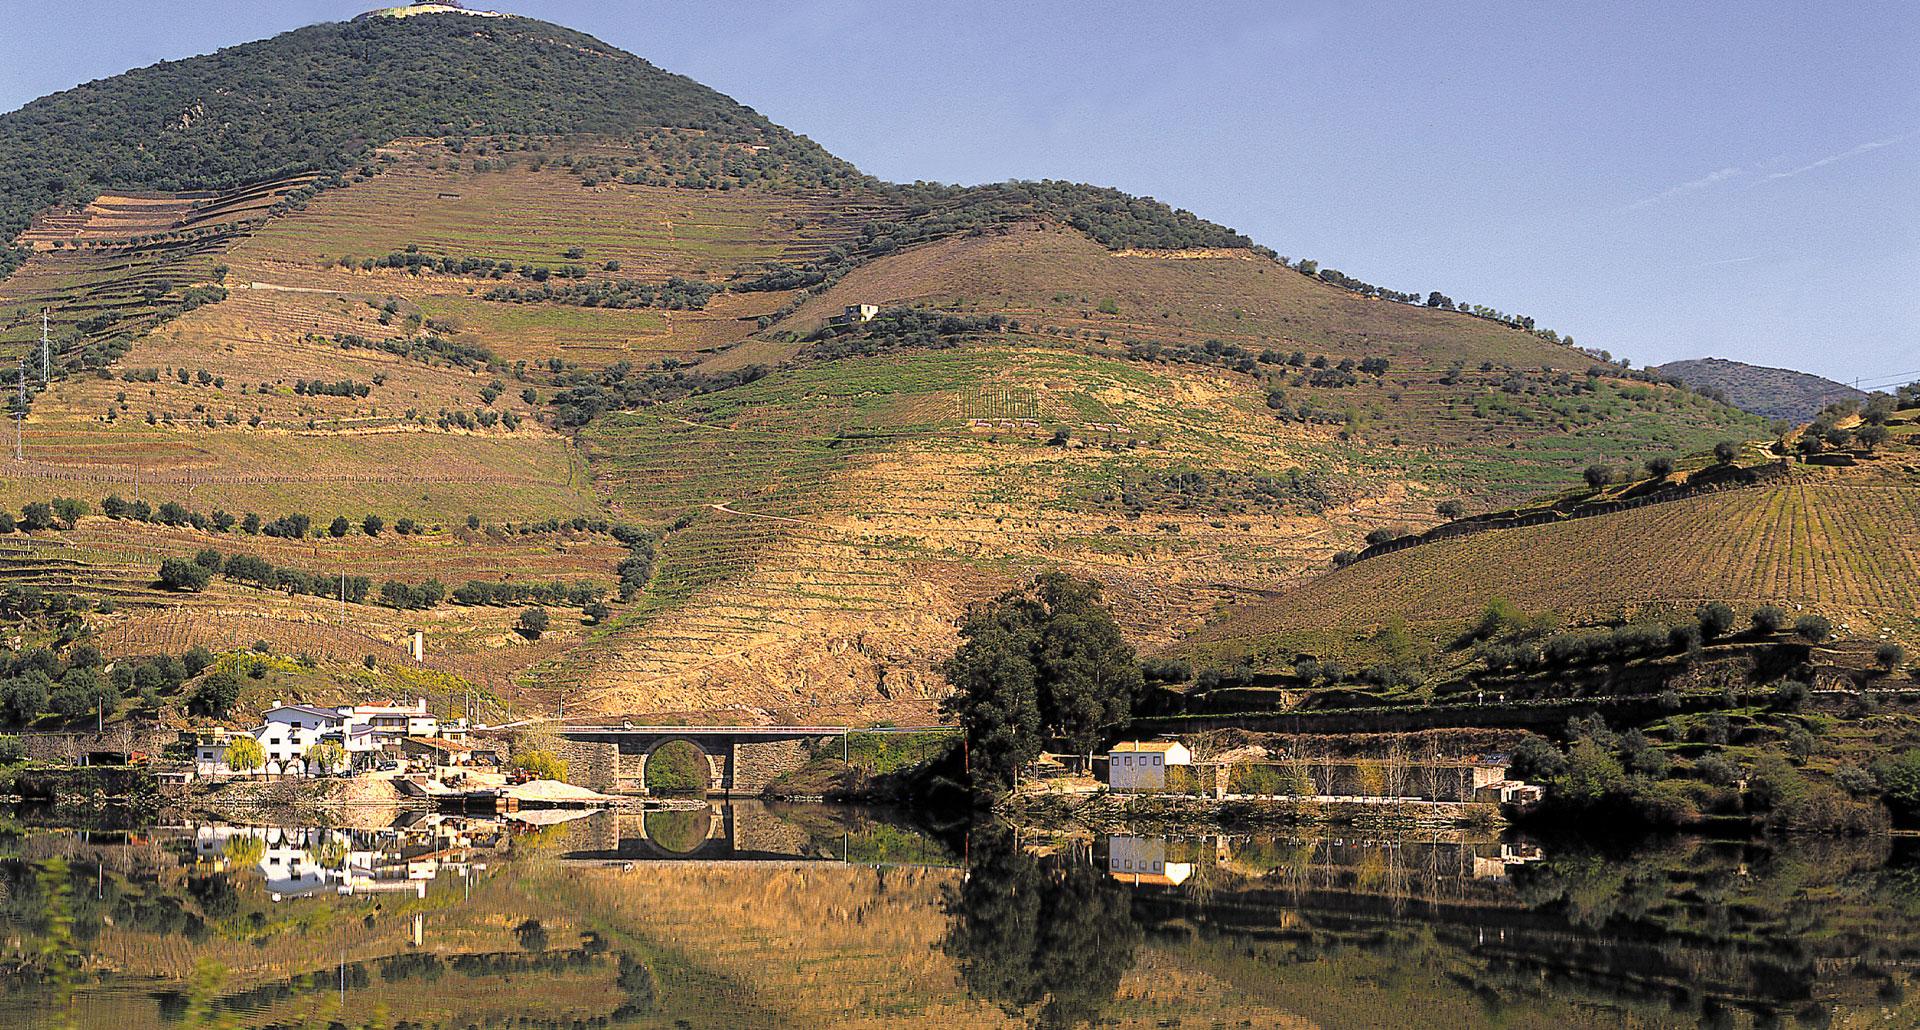 Douro 41 Hotel & Spa - boutique hotel in Castelo de Paiva